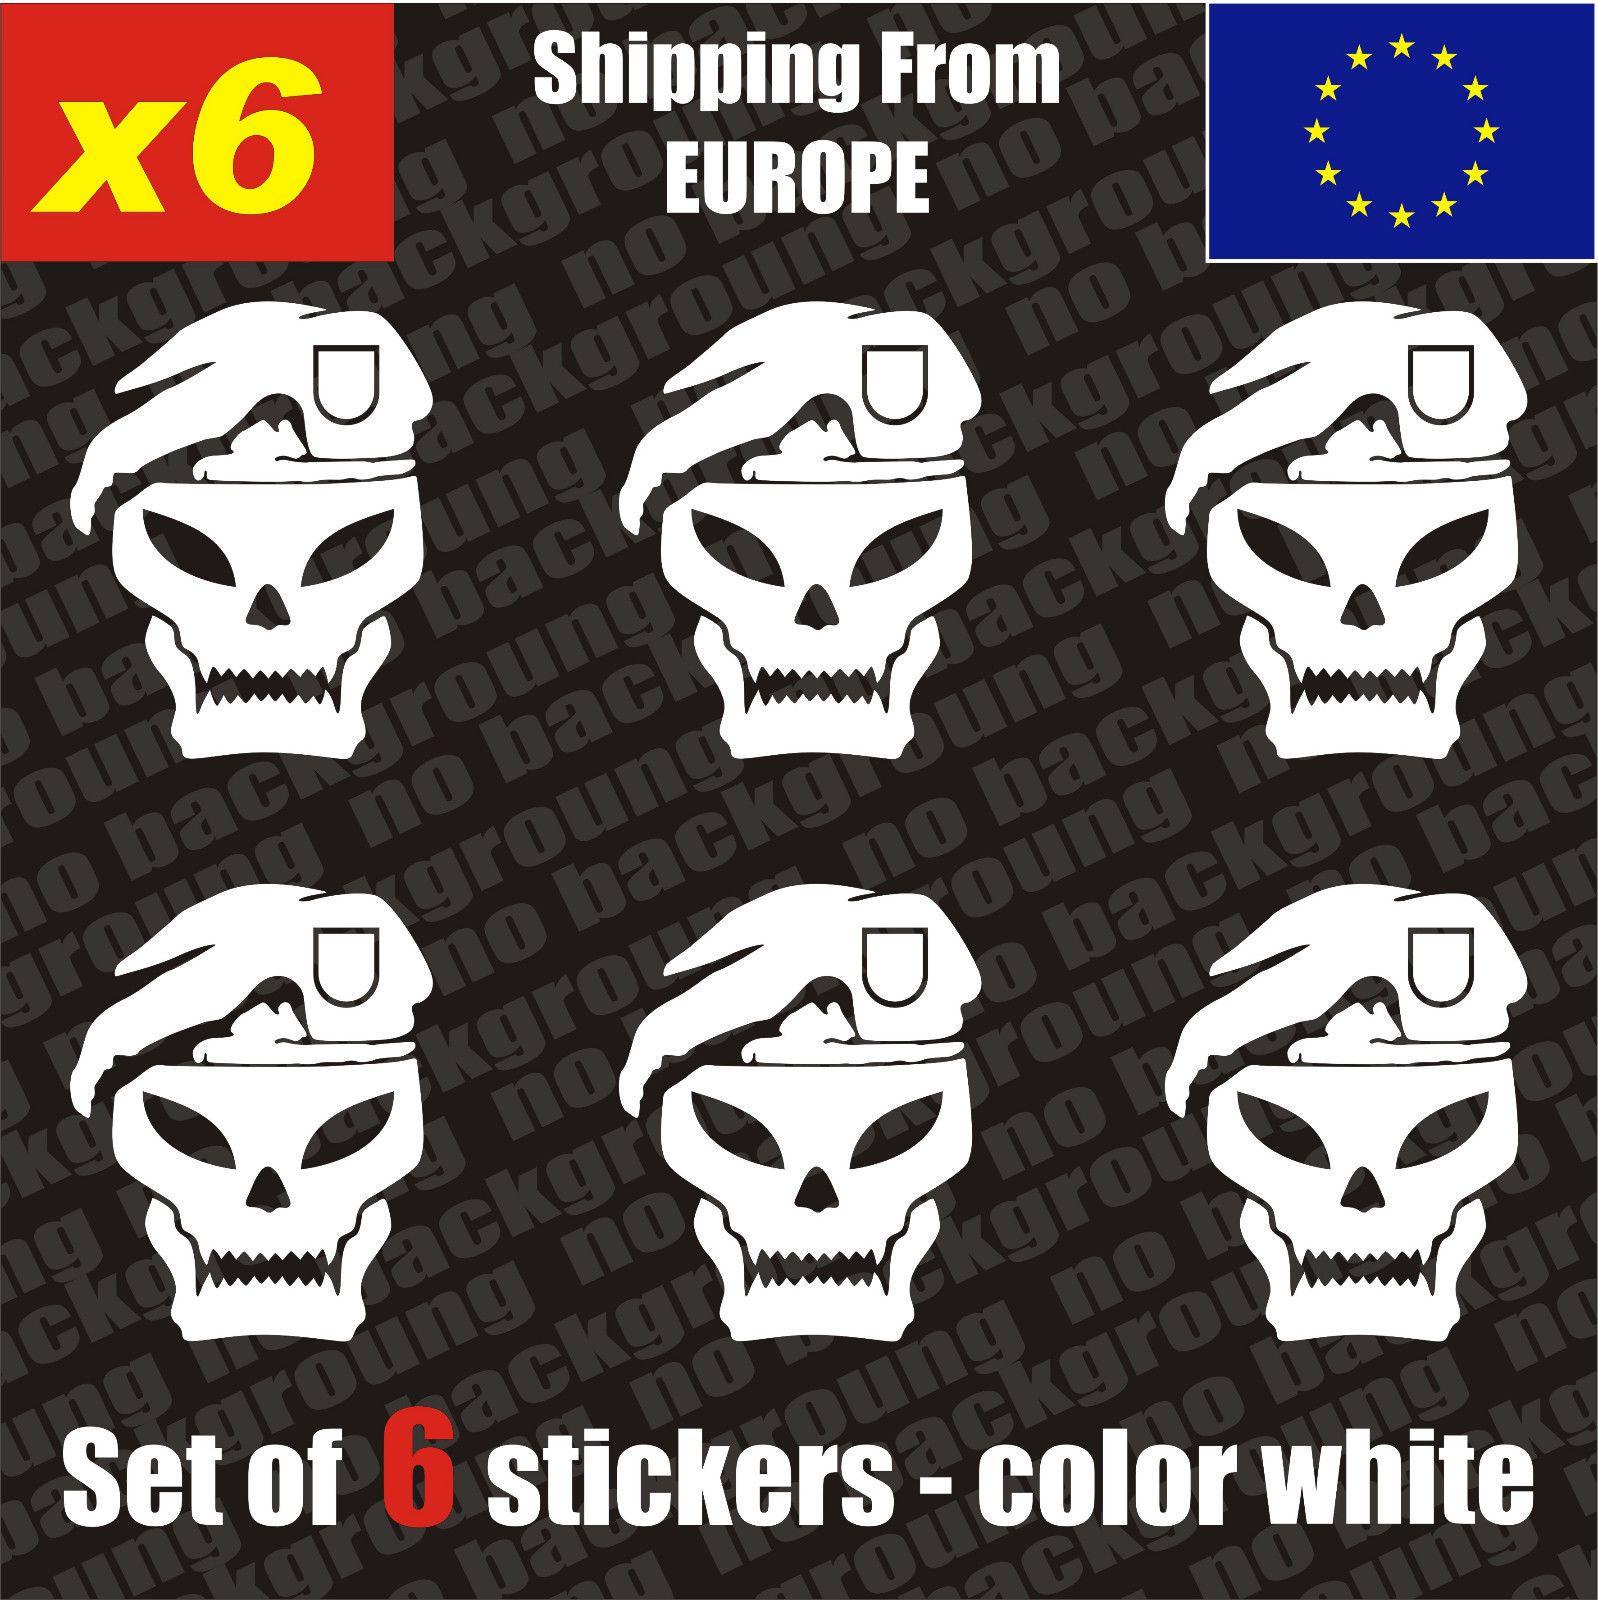 Set of 6 call of duty black ops logo vinyl sticker aufkleber die cut